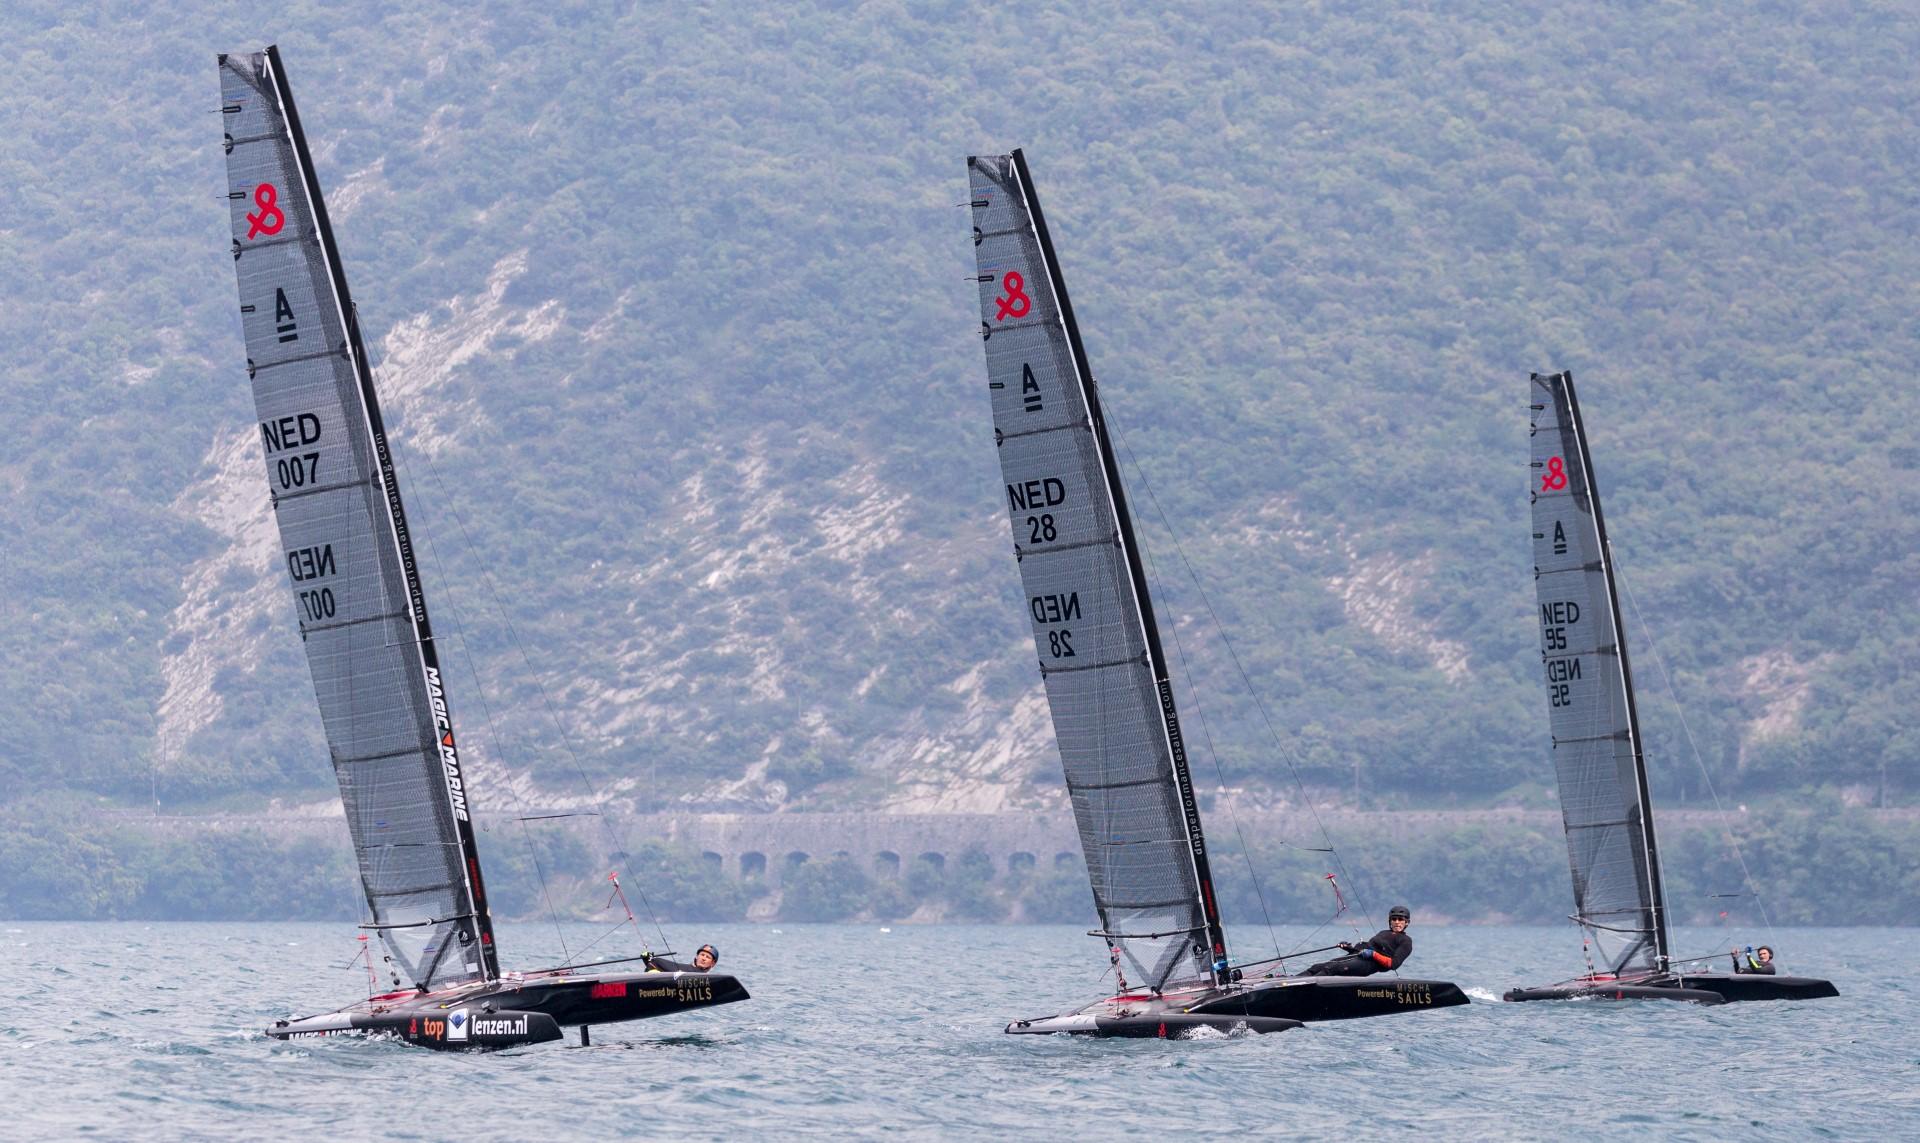 2017-A-class-catamaran-Spring-Cup-Lake-Garda-DNA-F1_3 freigegeben für Fitbleibenmitsegeln.de